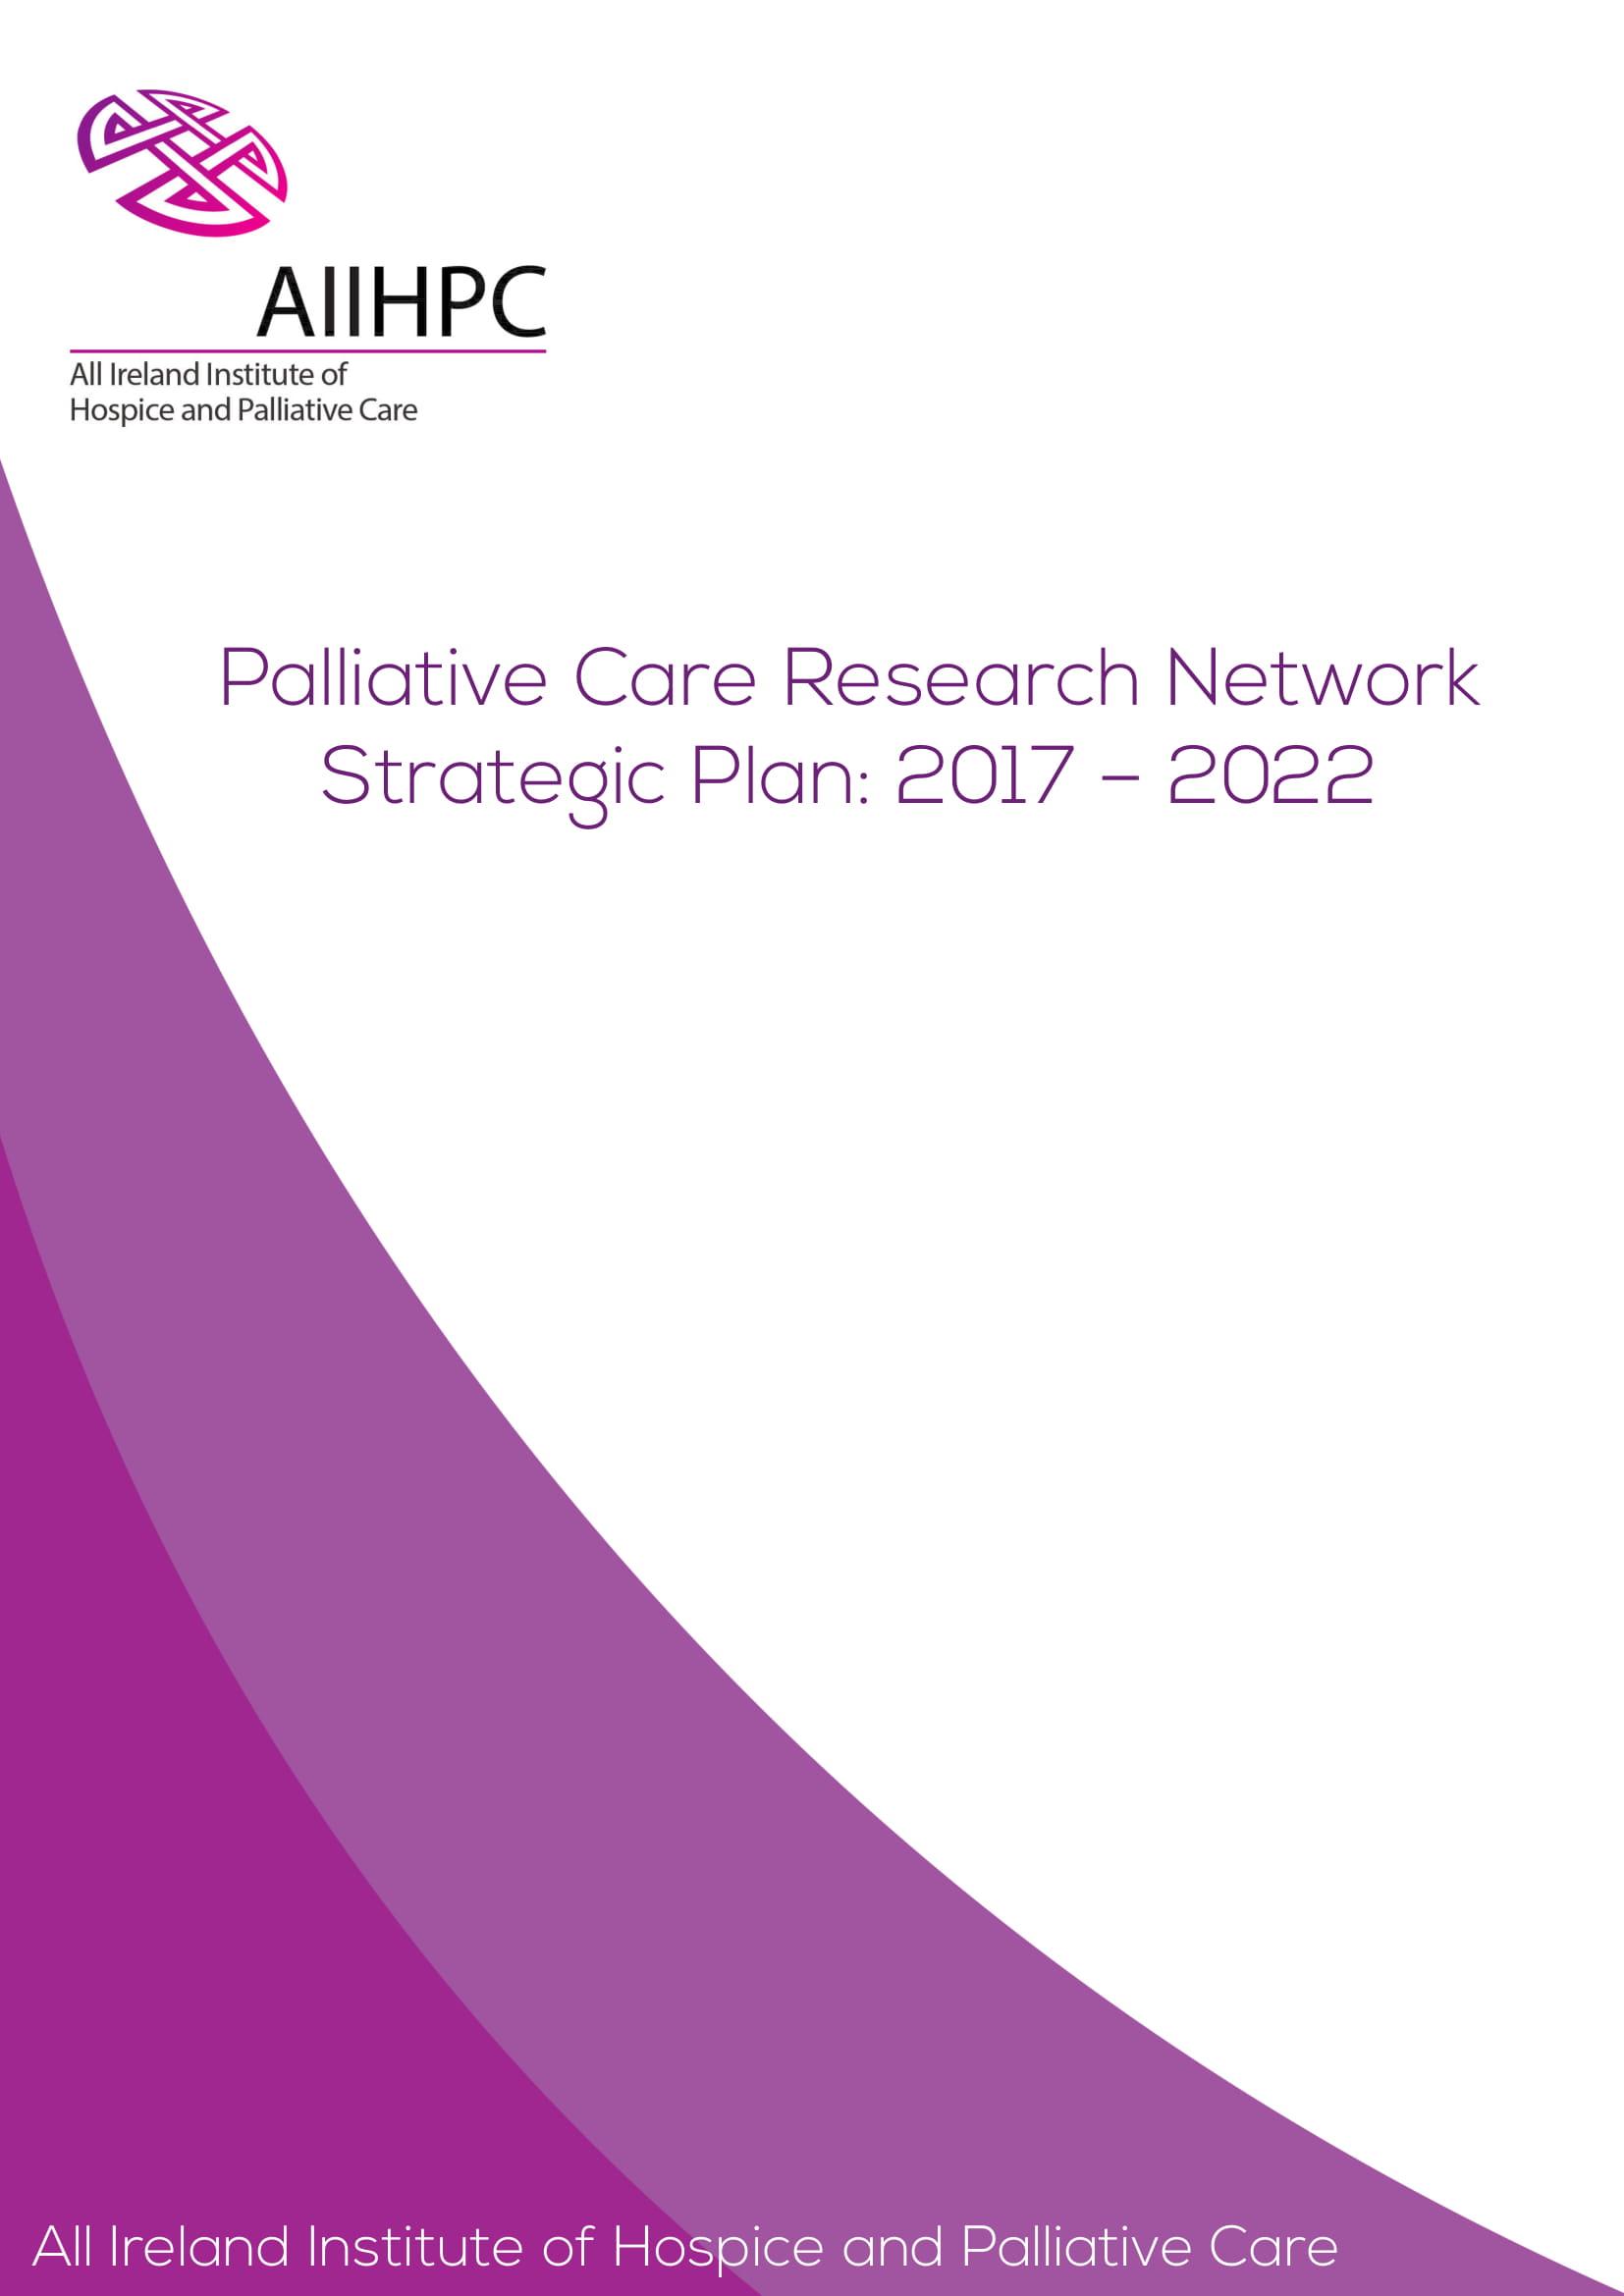 palliative care research network strategic plan example